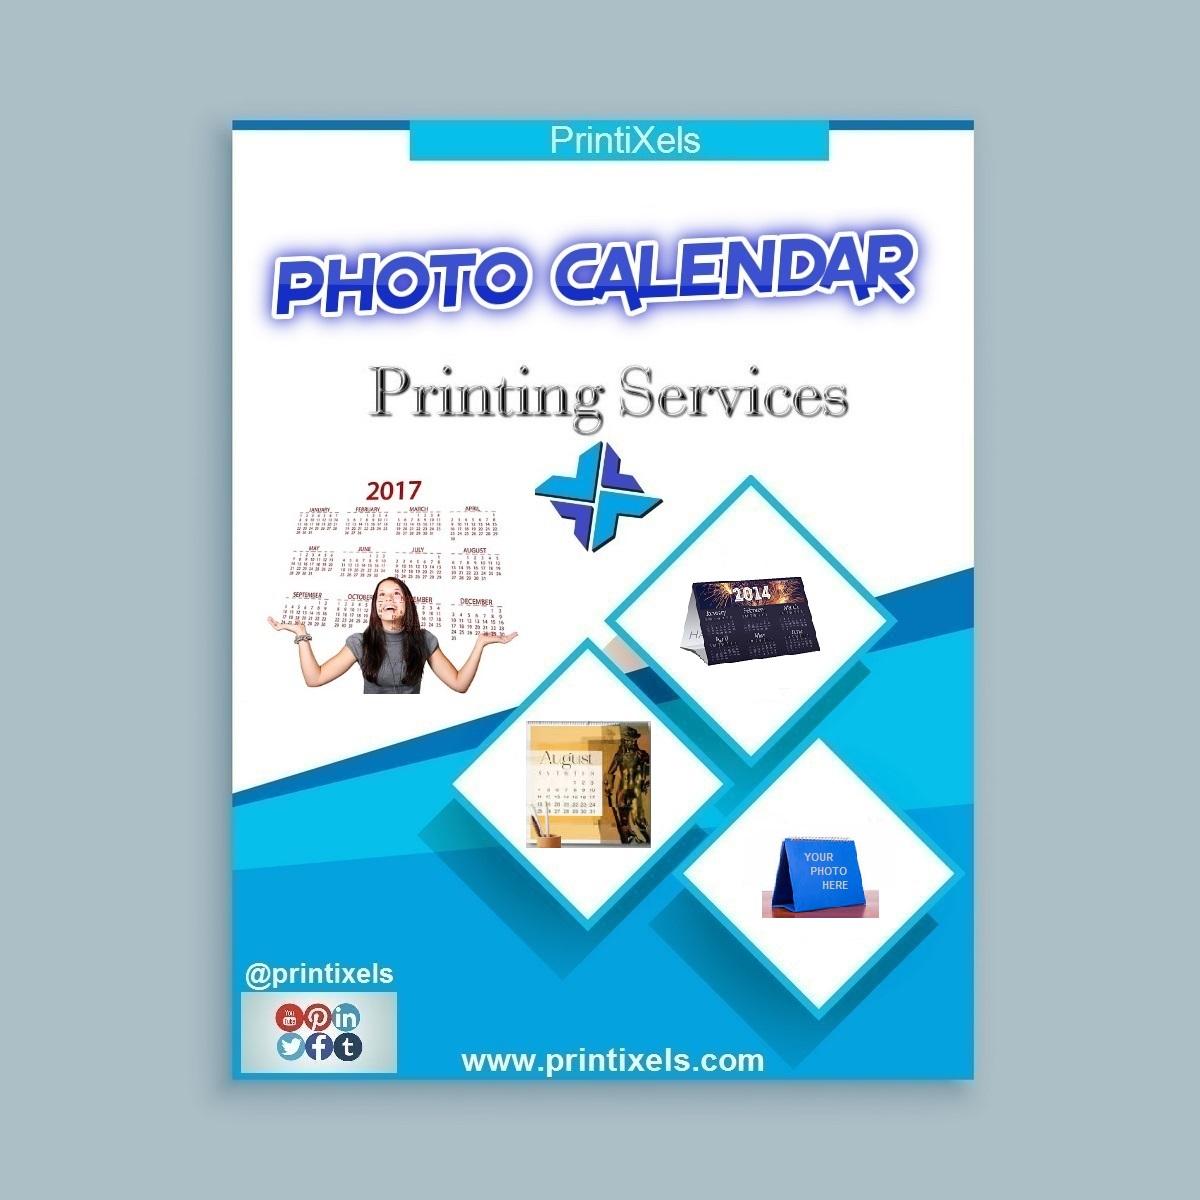 Photo Calendar Printing Services | Printixels™ Philippines with regard to Calendar Printing Services Philippines